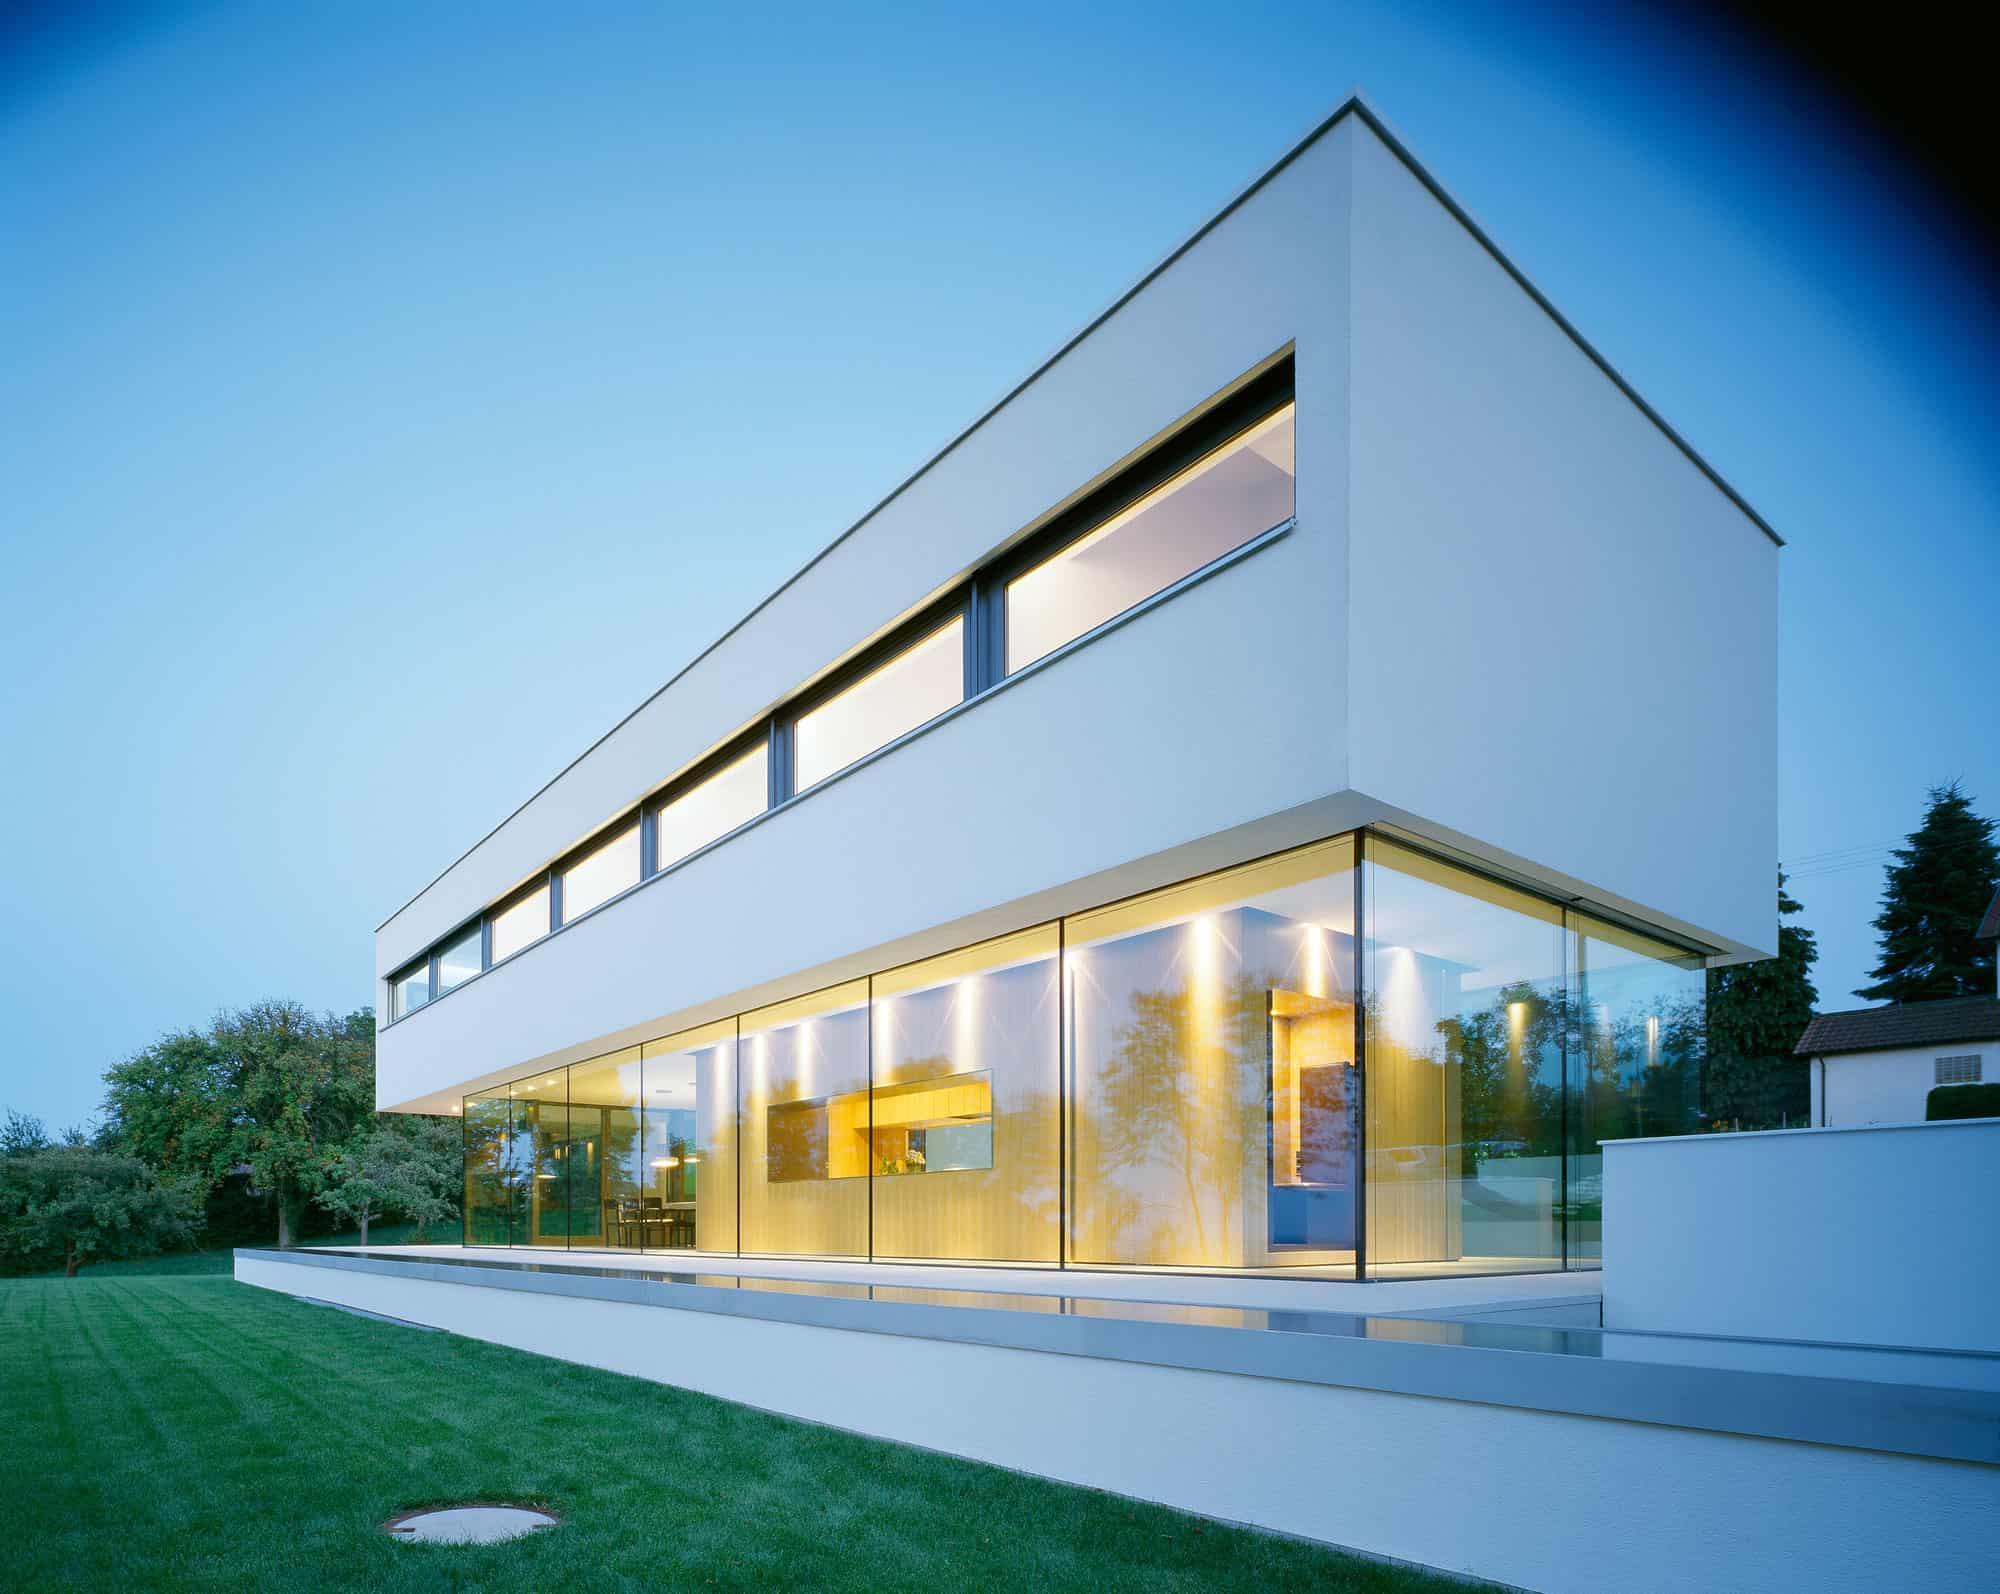 House philipp by philipp architekten - Philipp architekten ...